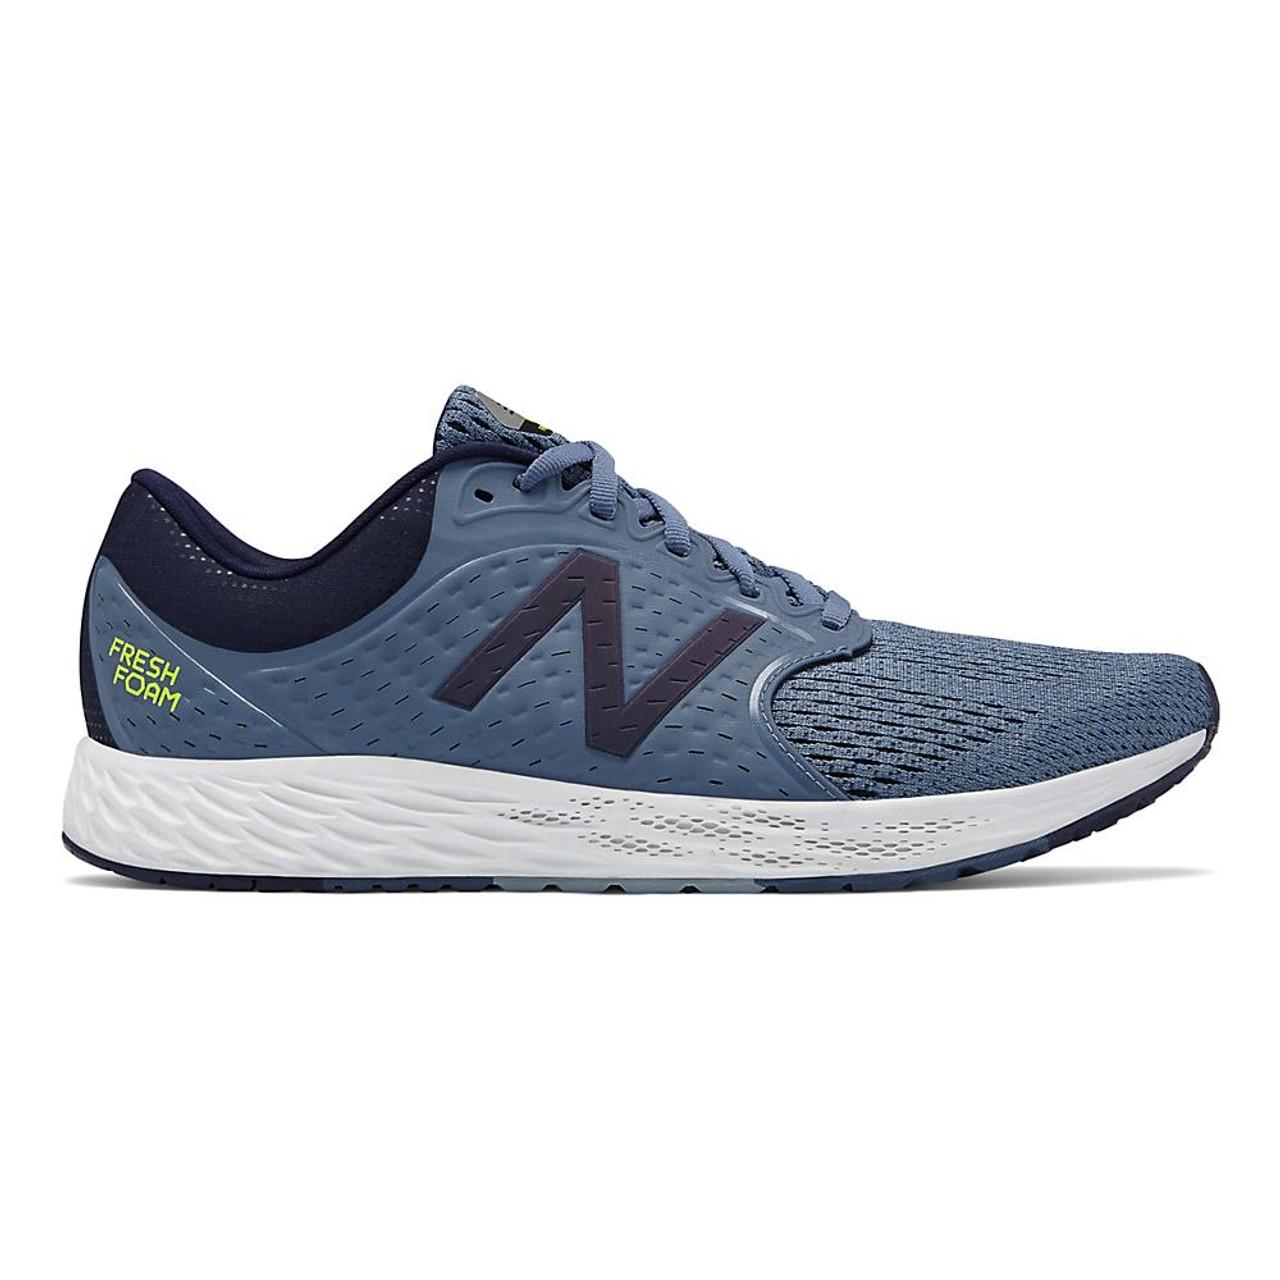 New Balance Fresh Foam Zante v4 Shoe